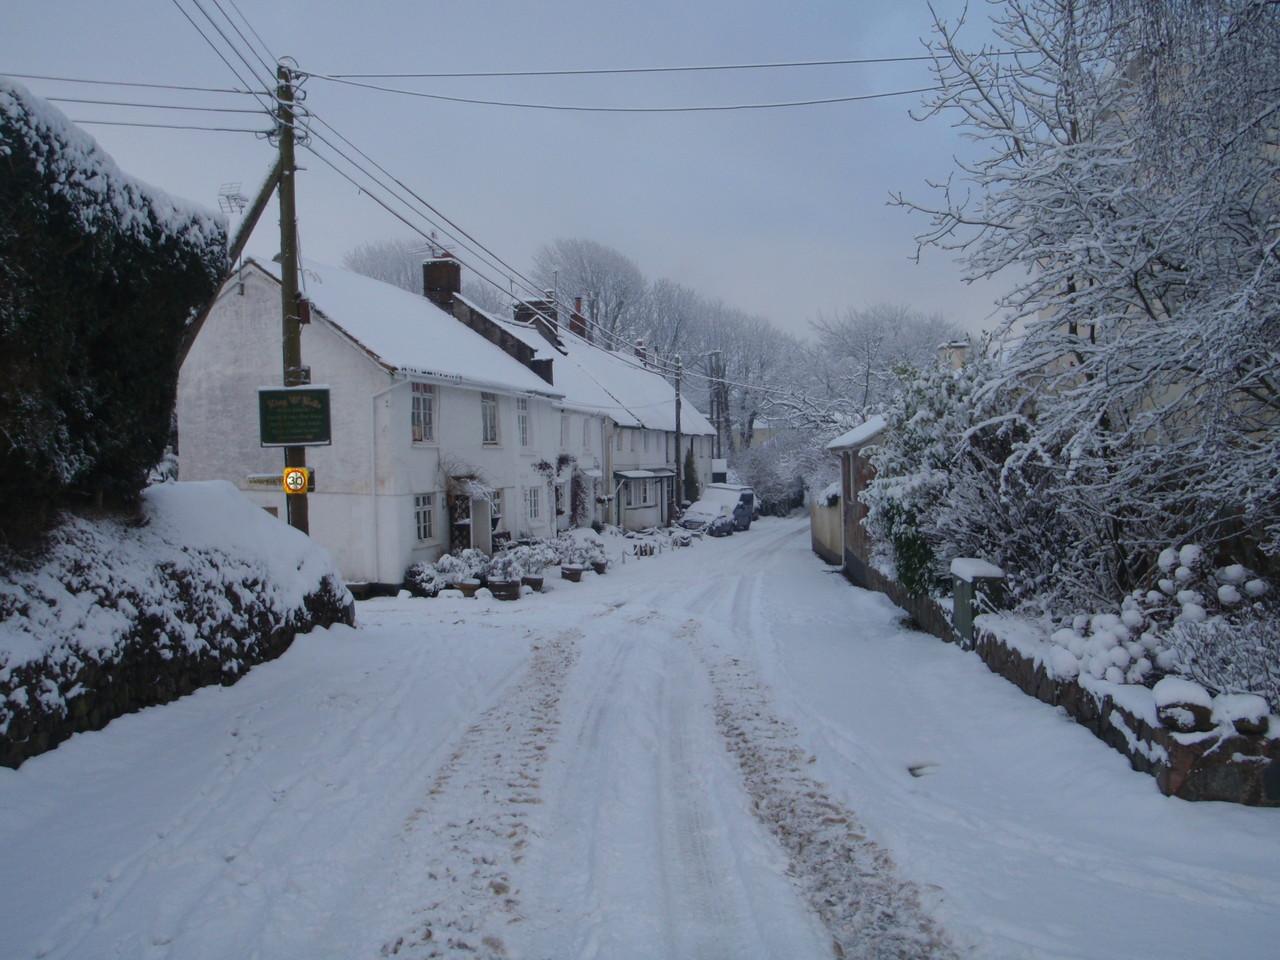 Prixford Cottages, Jan '10